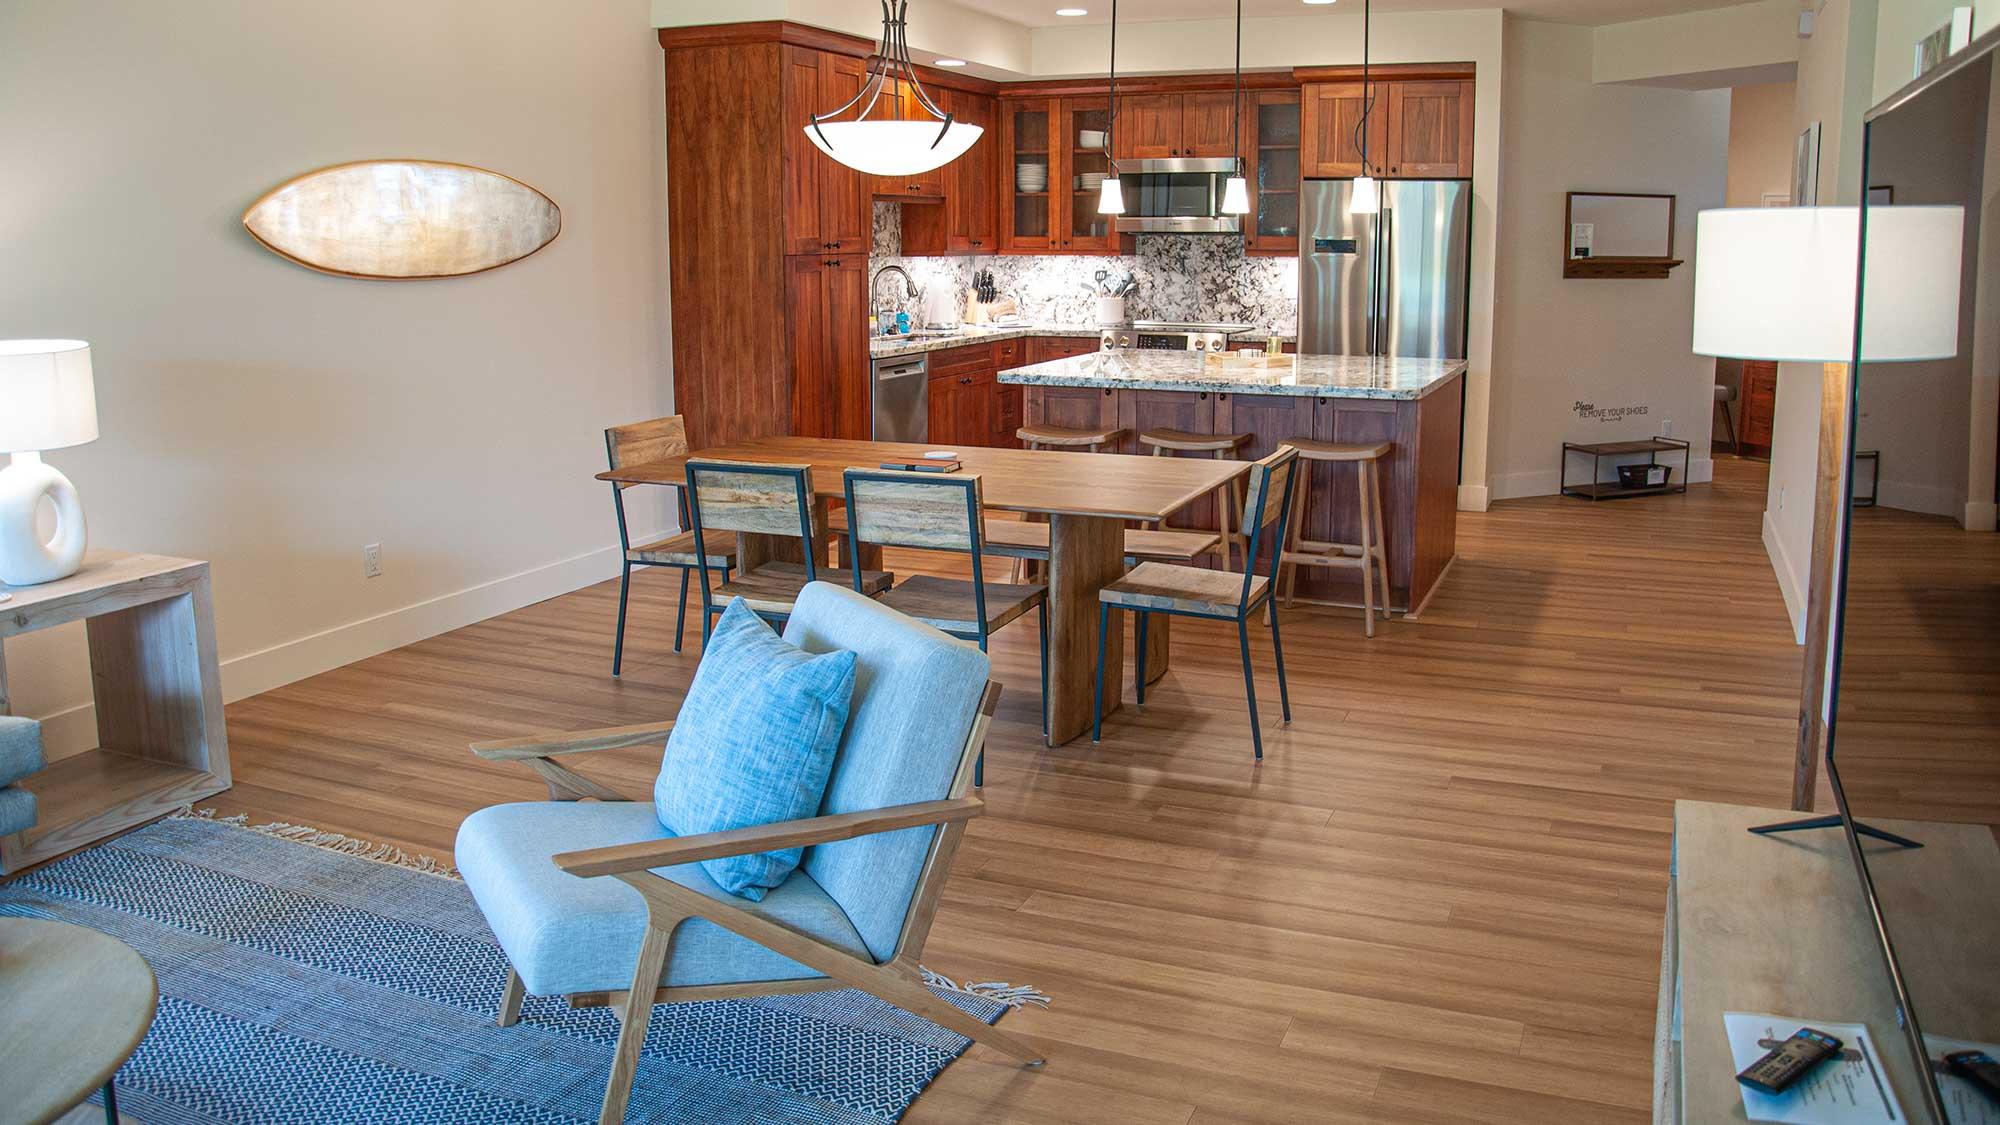 Pili Mai Resort at Poipu #05J - Open Great Living Room - Parrish Kauai